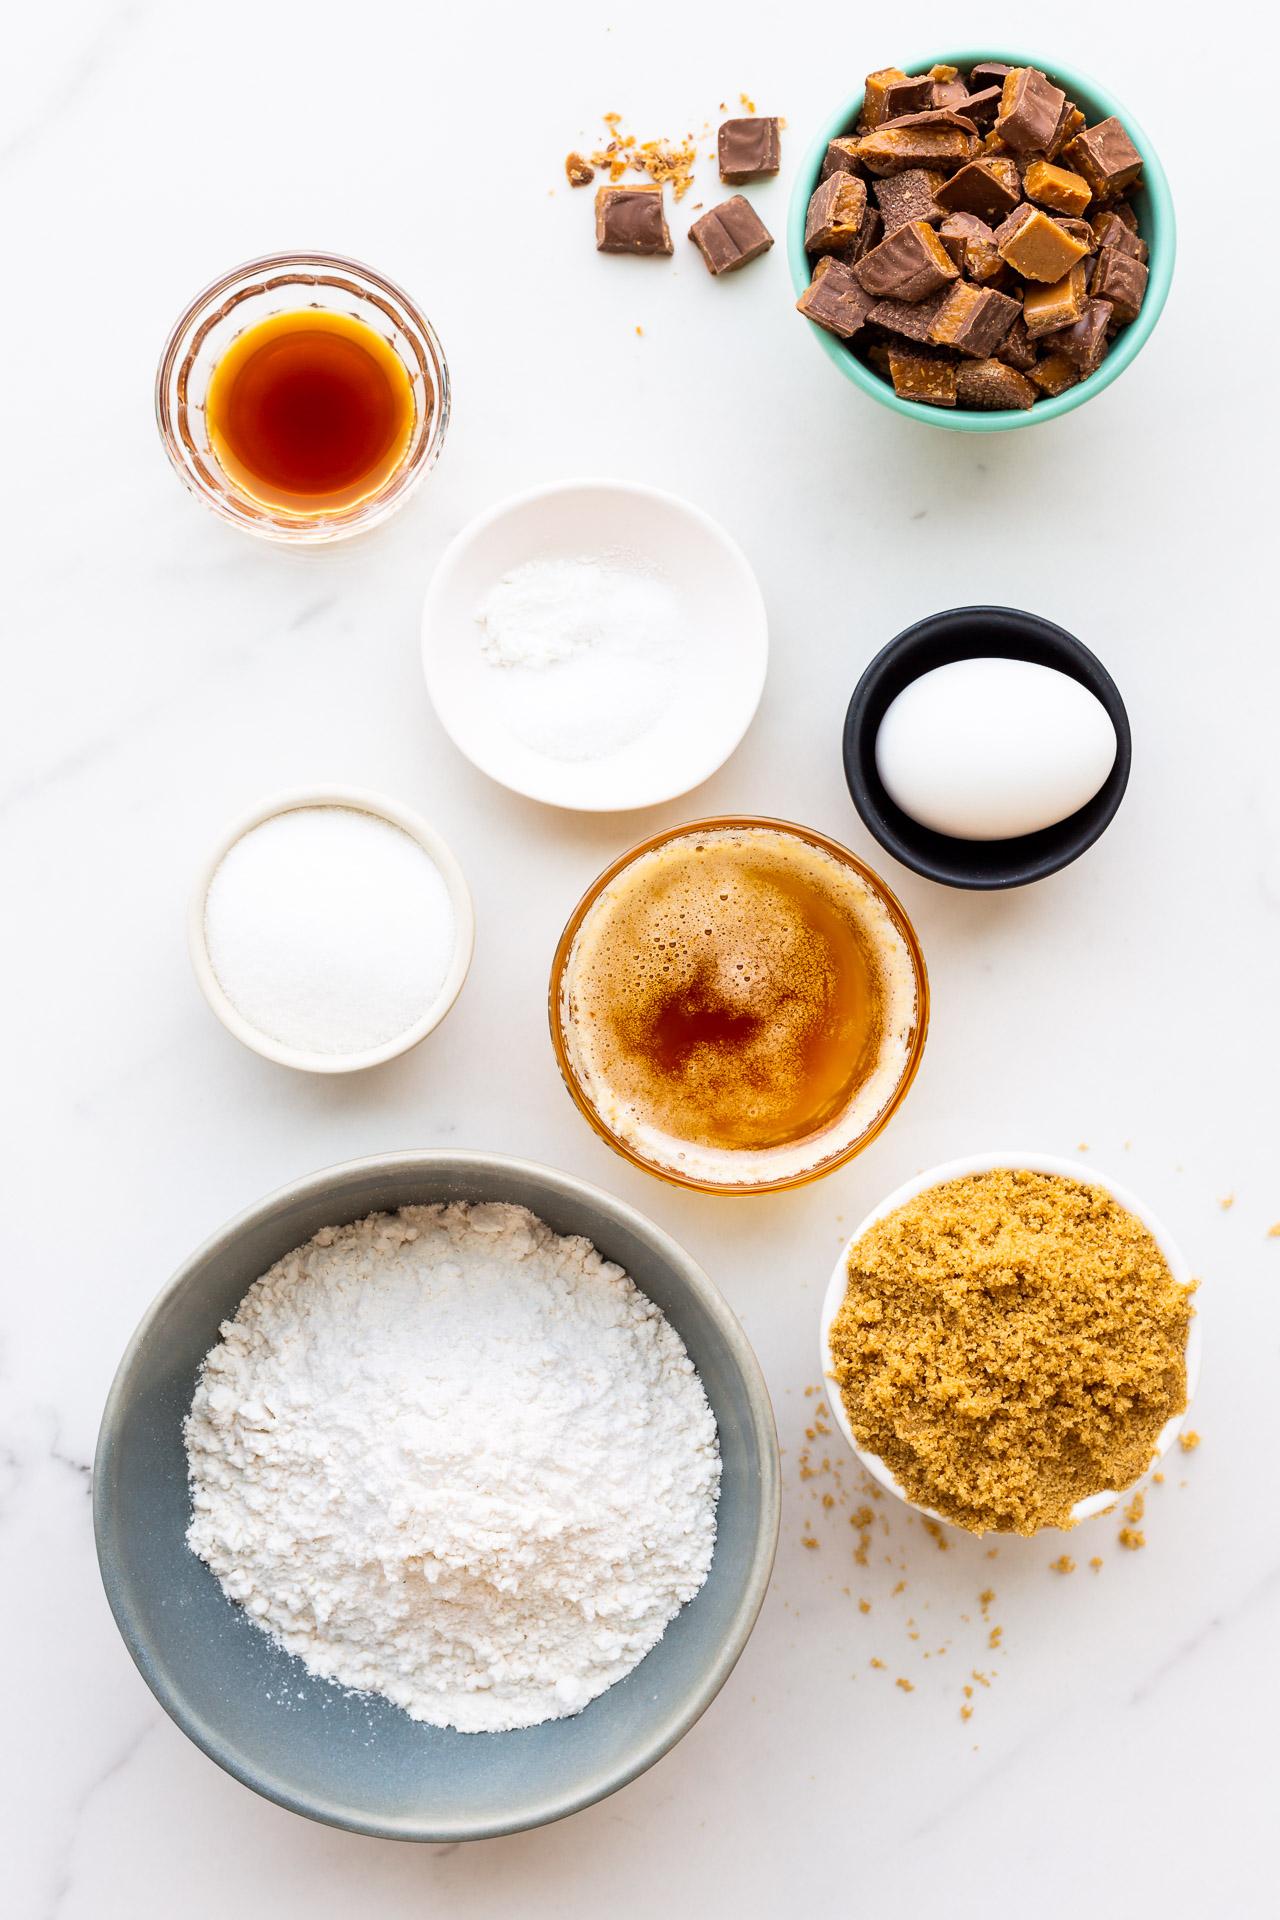 Ingredients measured out to make Skor cookie bars, with browned butter, dark brown sugar, vanilla, an egg, leaveners, salt, flour, and lots of chopped Skor bars